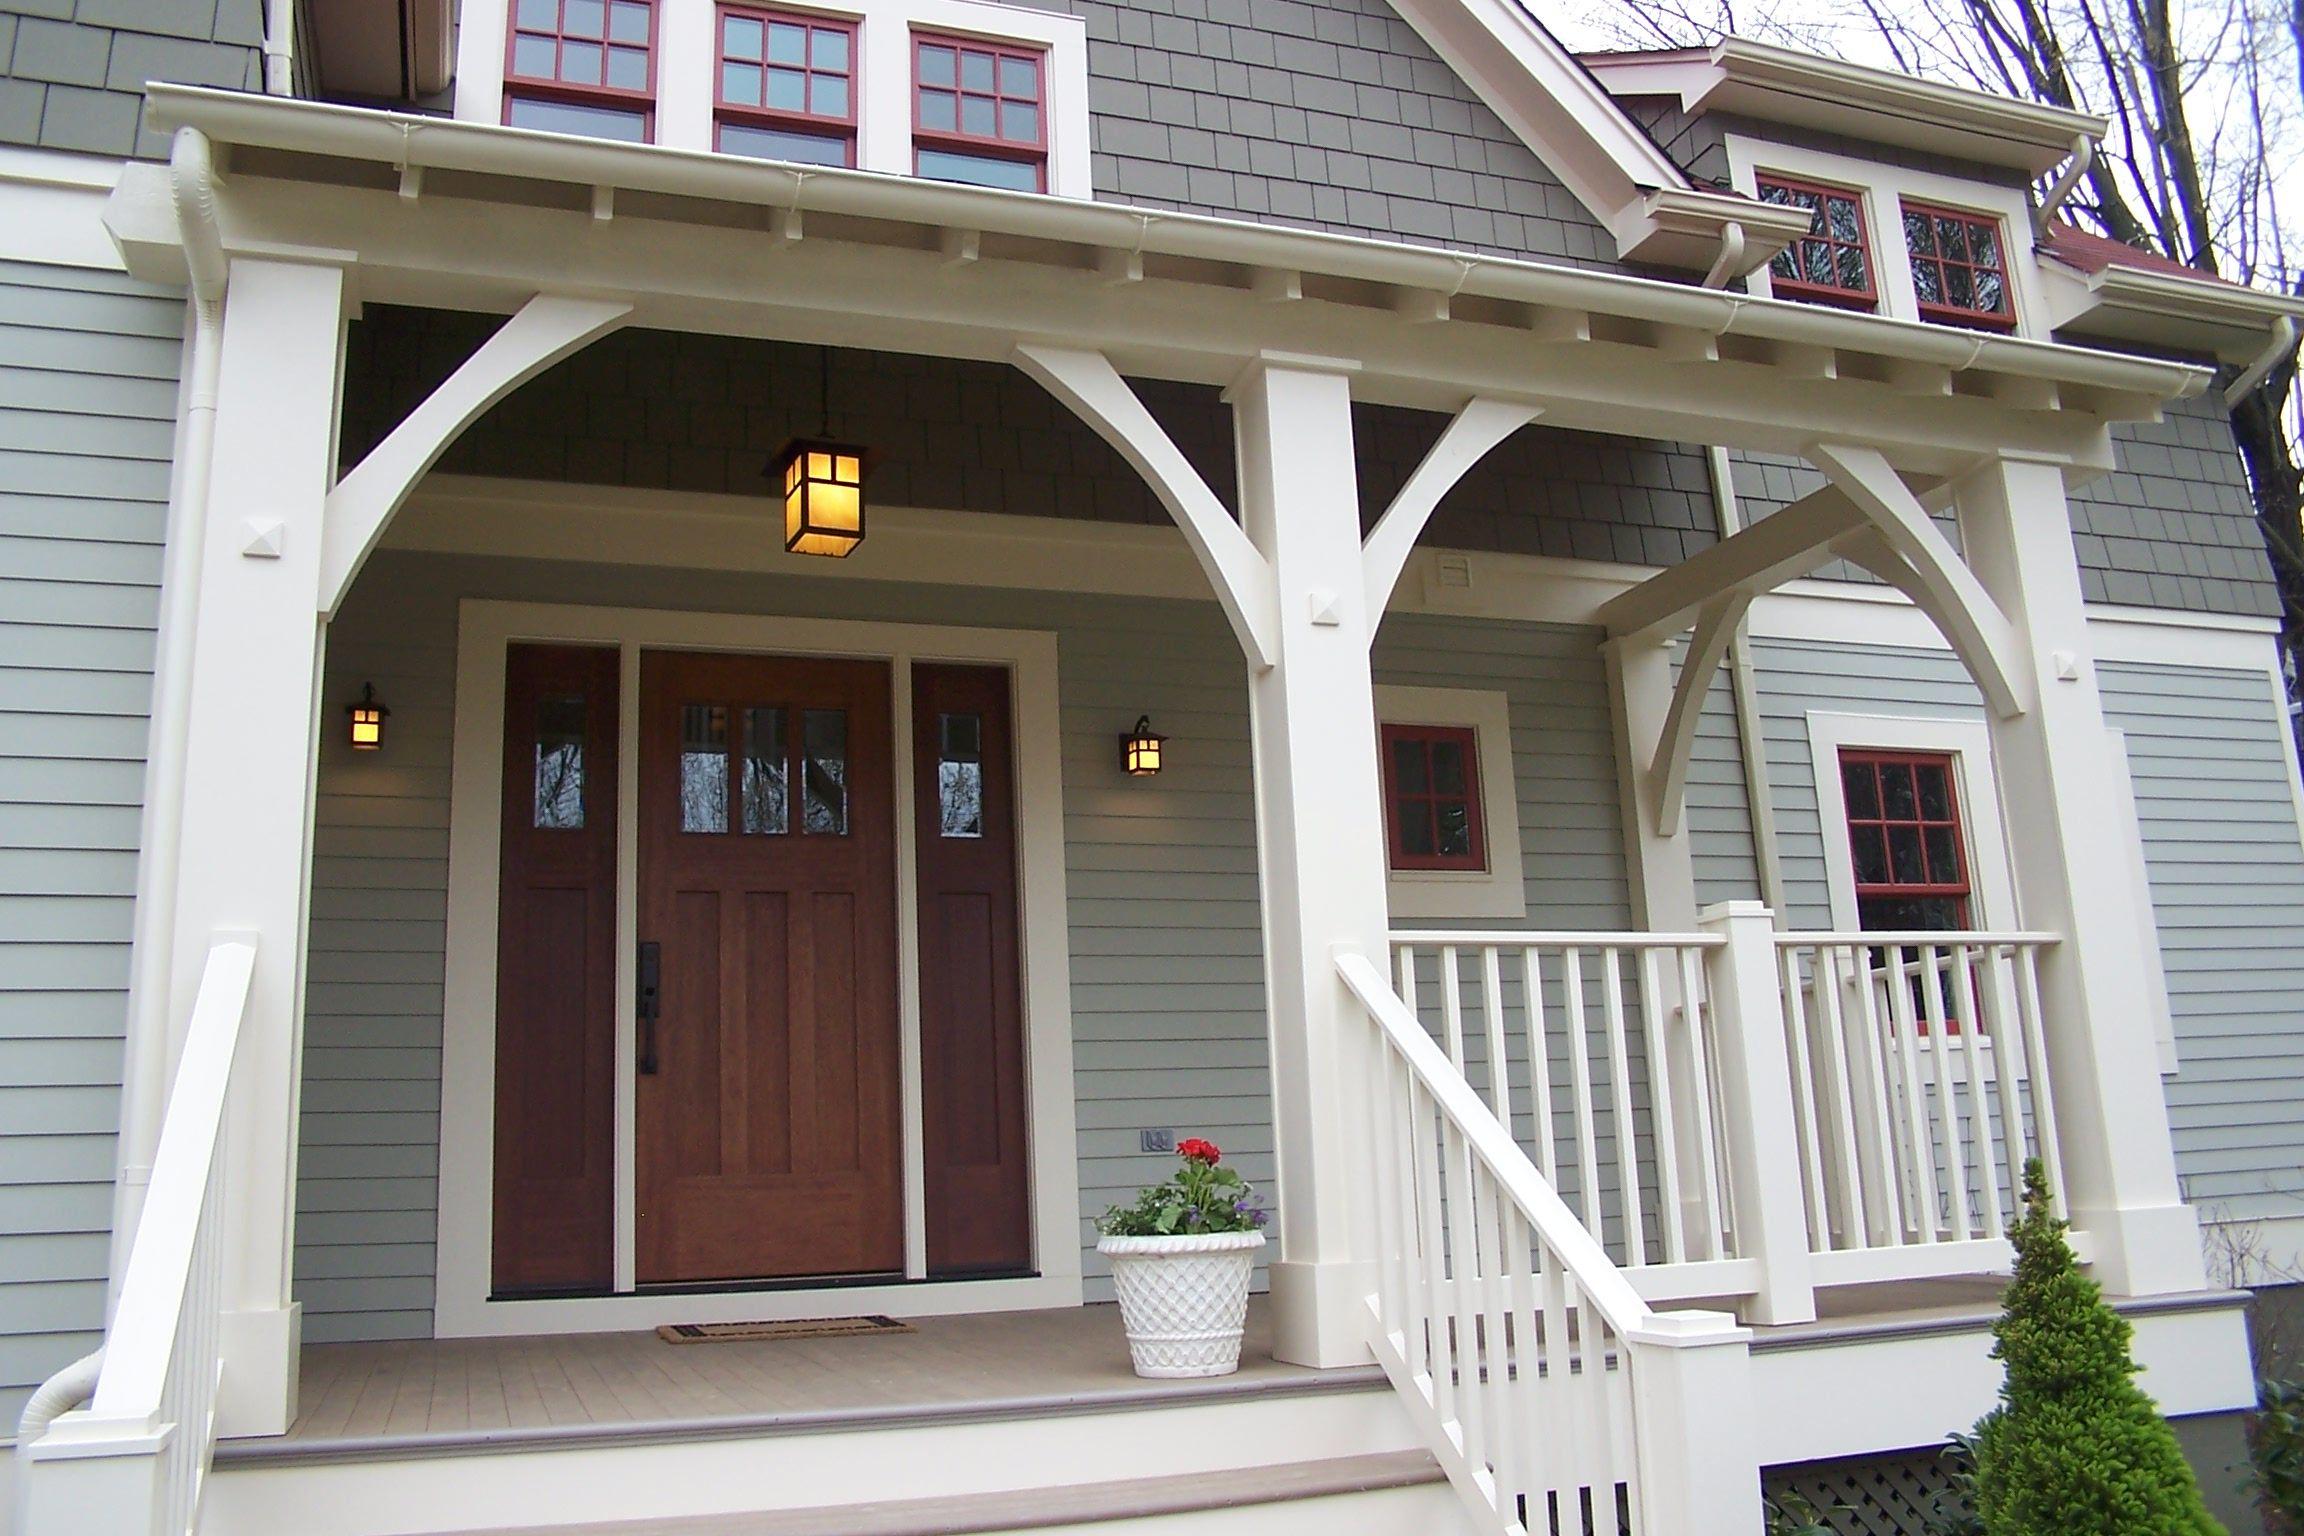 Decorative Porch Posts Craftsman Style Porches Pinterest Front Porches Front Doors And Porch